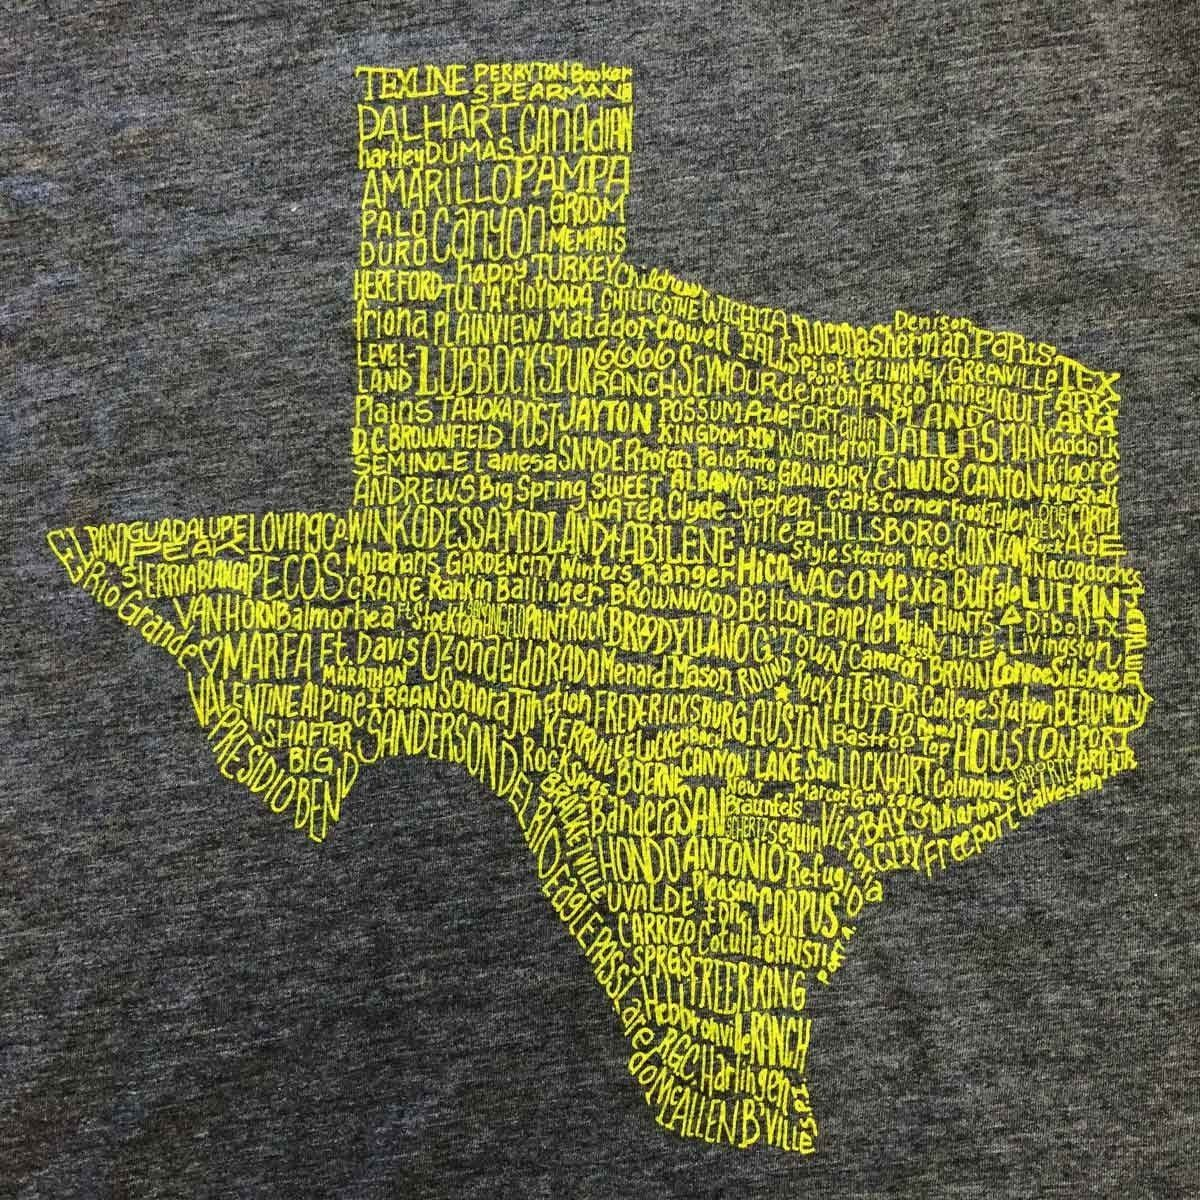 Towns T-shirt - Texas Humor Store - 2